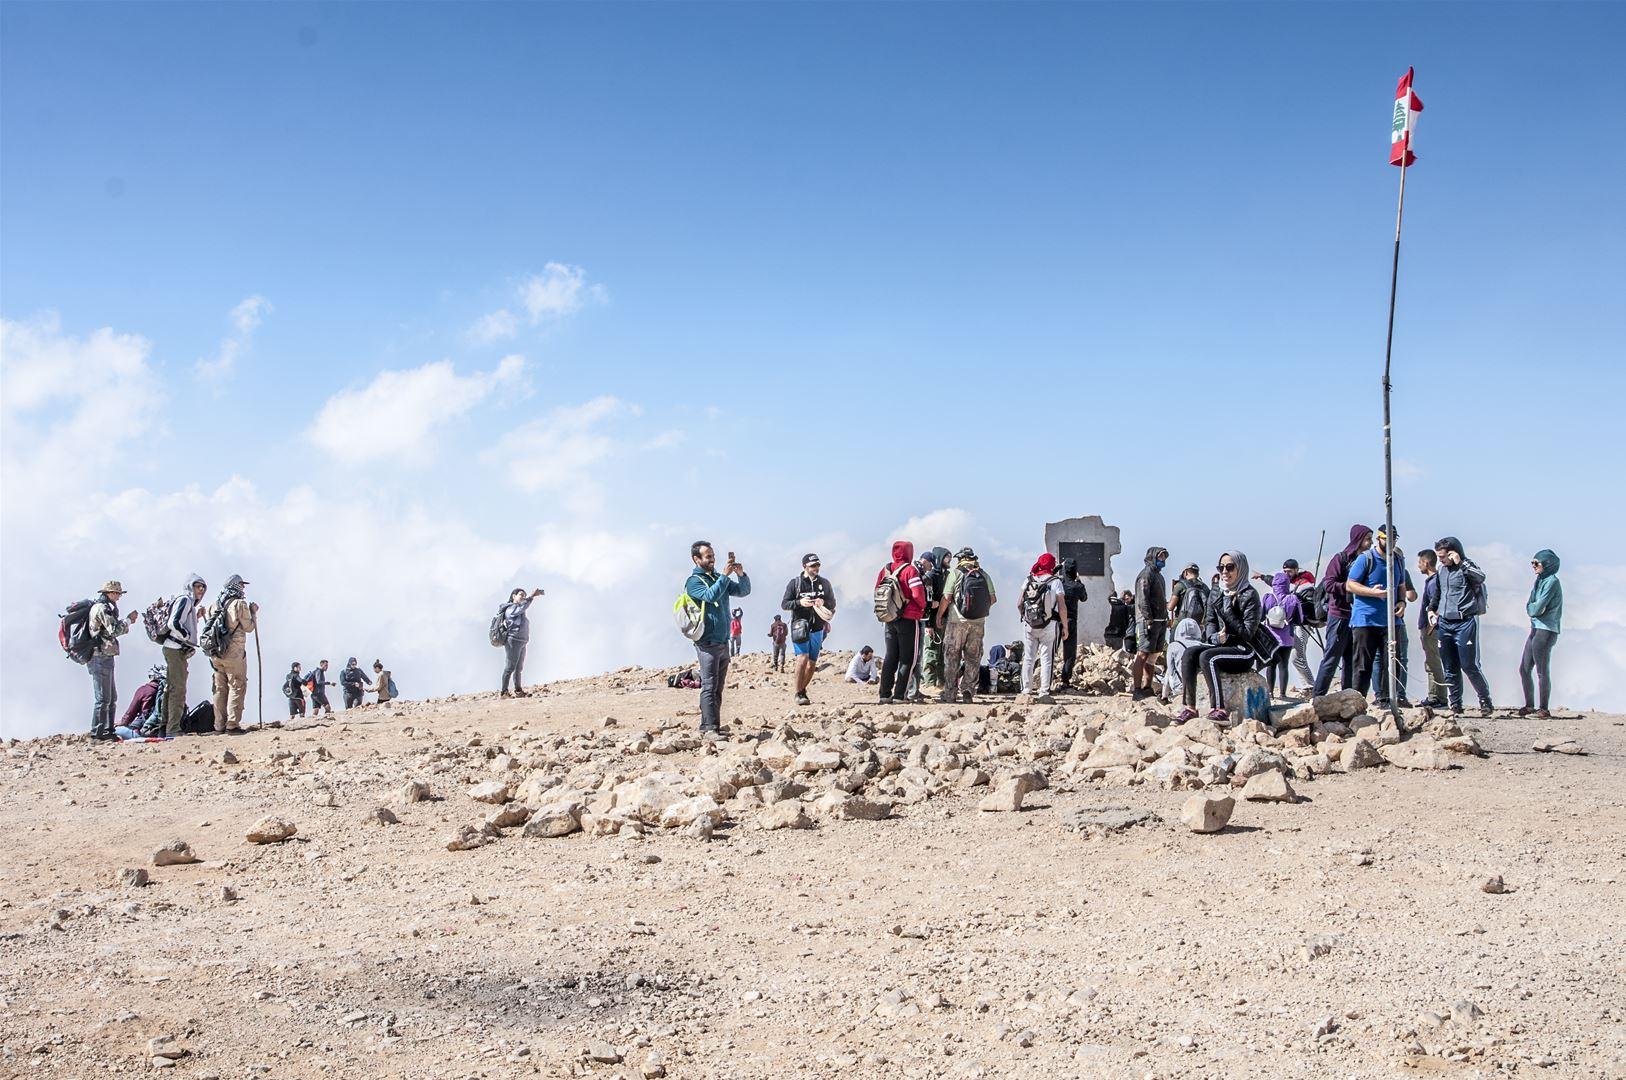 The Black Peak, The highest Point in Lebanon at 3088M (Black Peak)